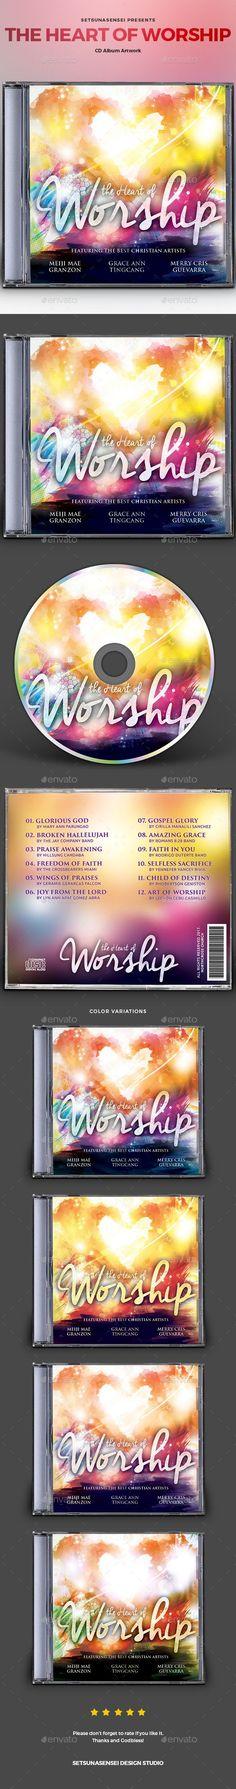 The Heart of Worship CD Album Artwork